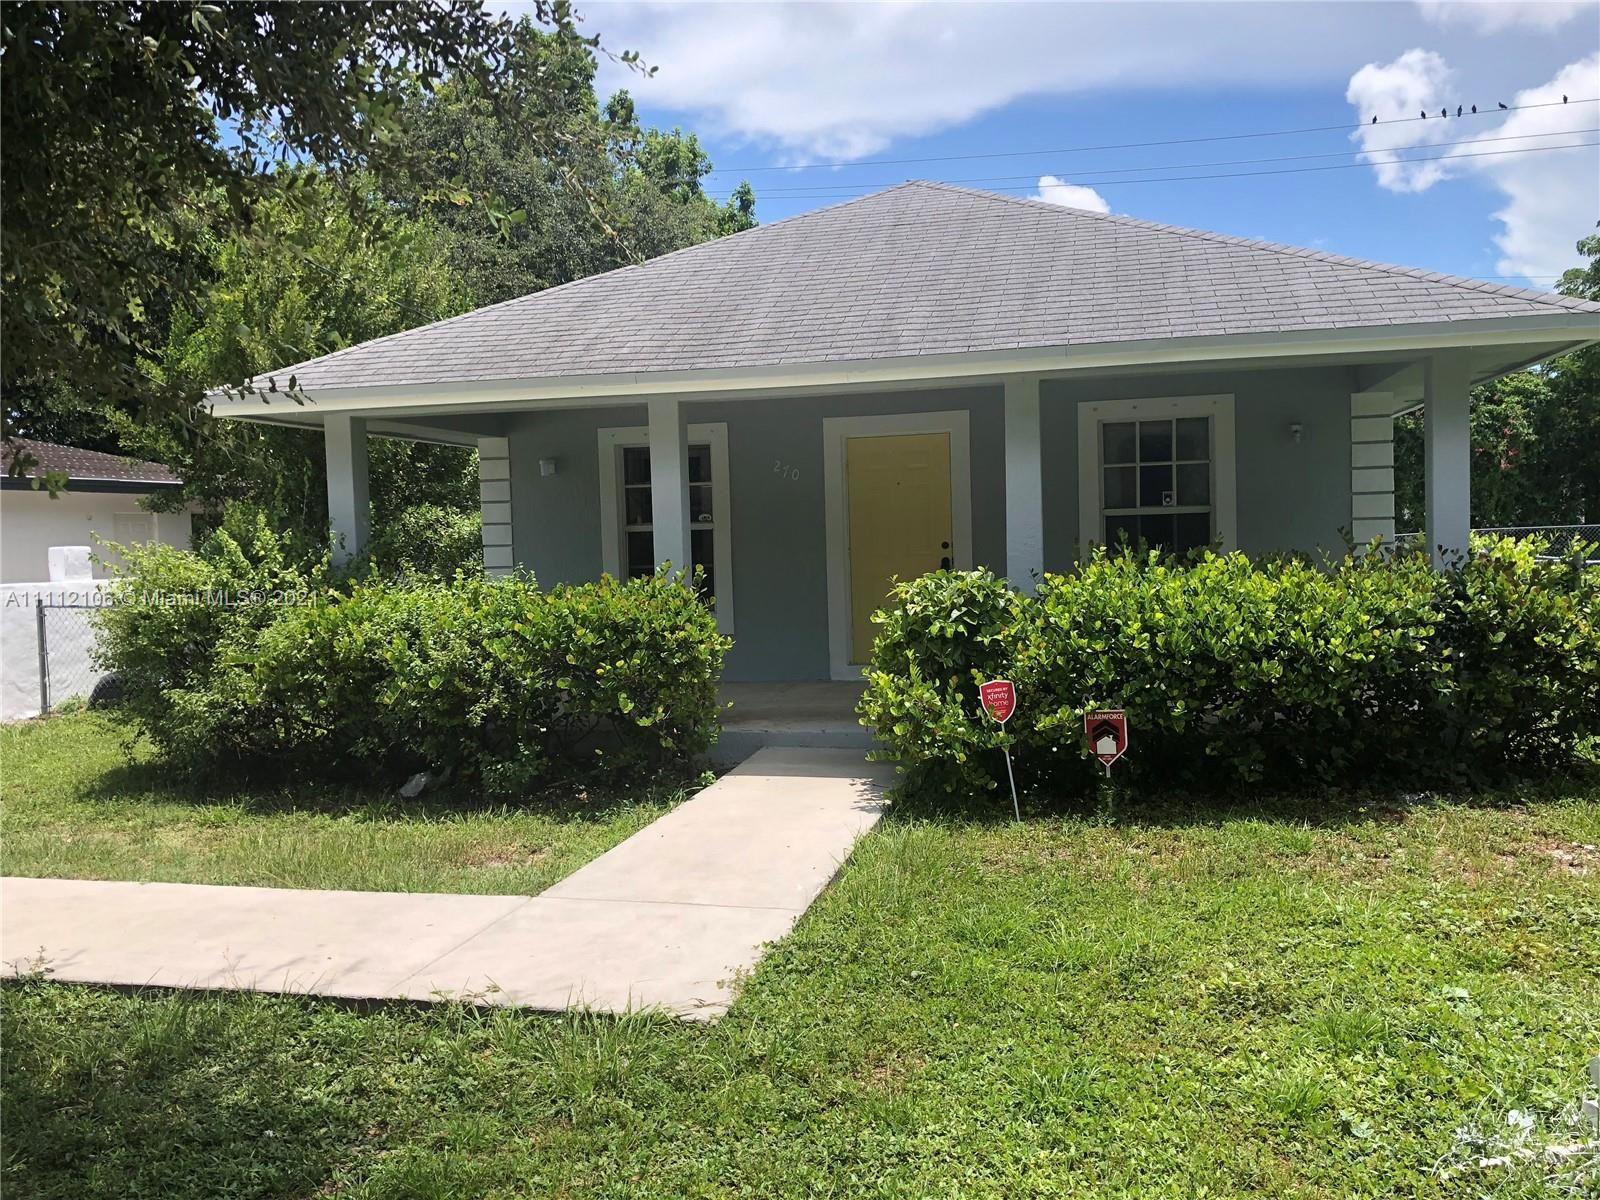 270 NW 41st St, Miami, FL 33127 - #: A11112106